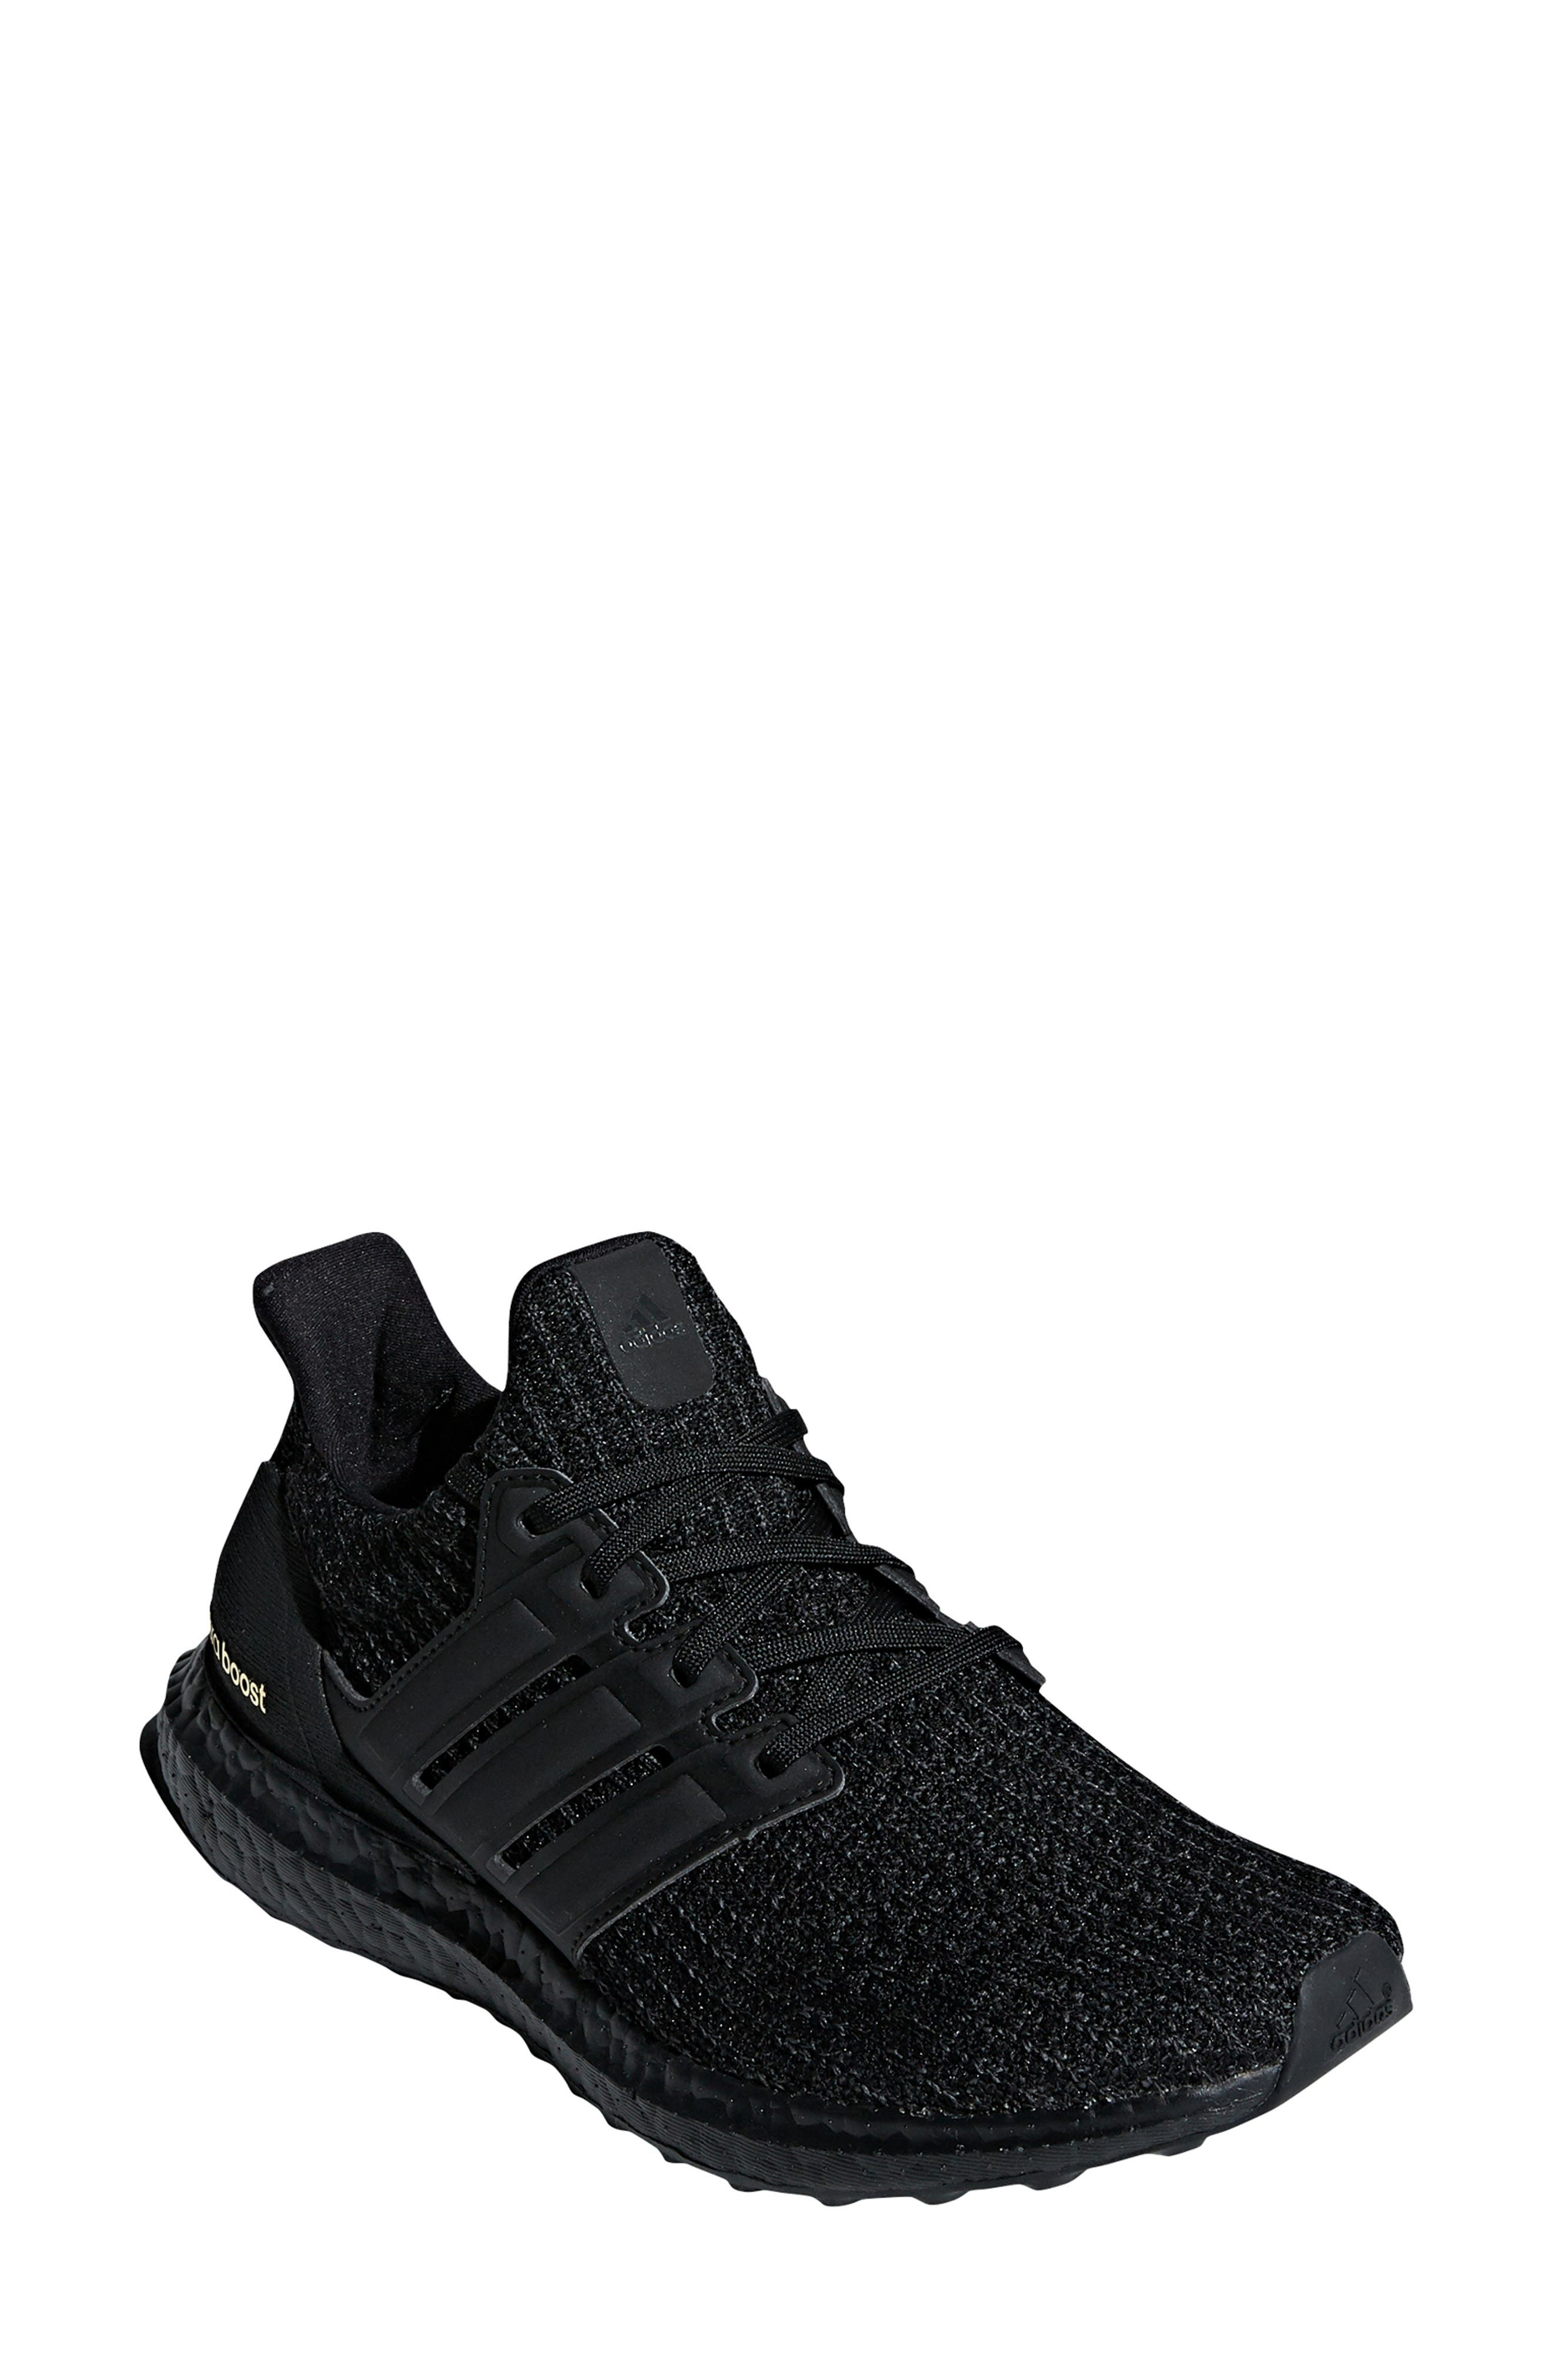 ADIDAS 'UltraBoost' Running Shoe, Main, color, CORE BLACK/ GOLD METALLIC